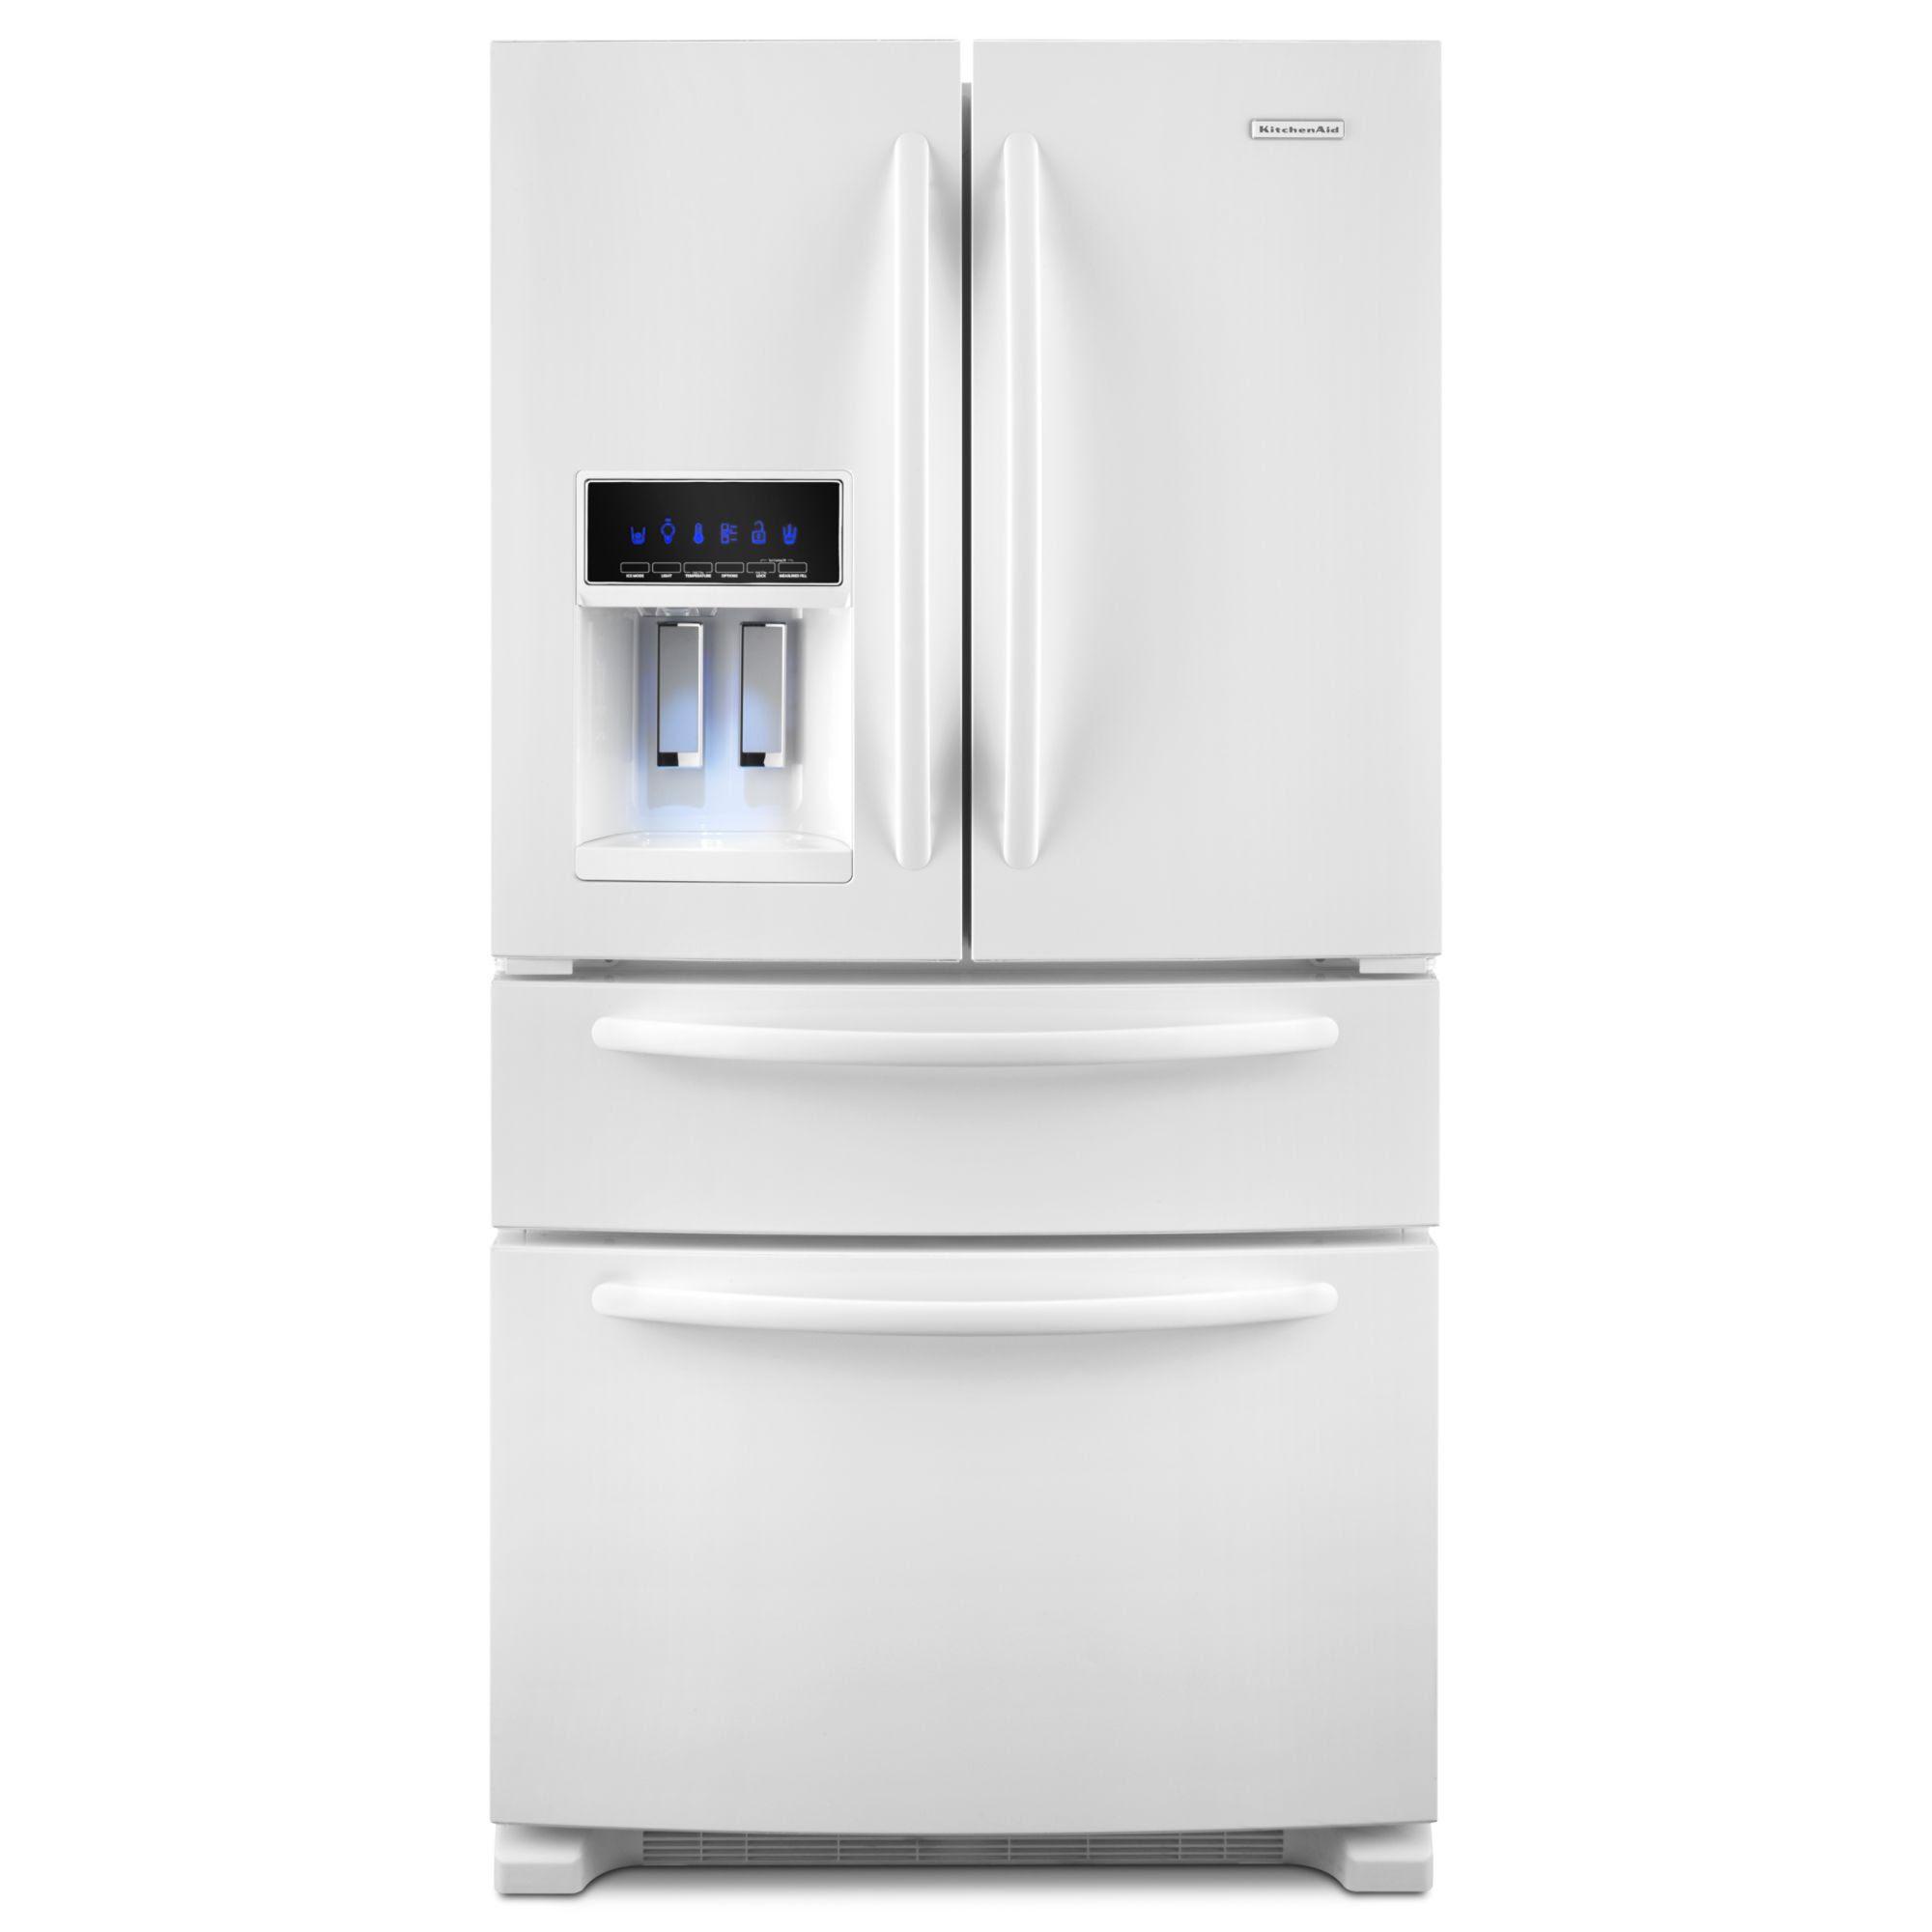 UPC KitchenAid 25 0 cu ft French Door Refrigerator